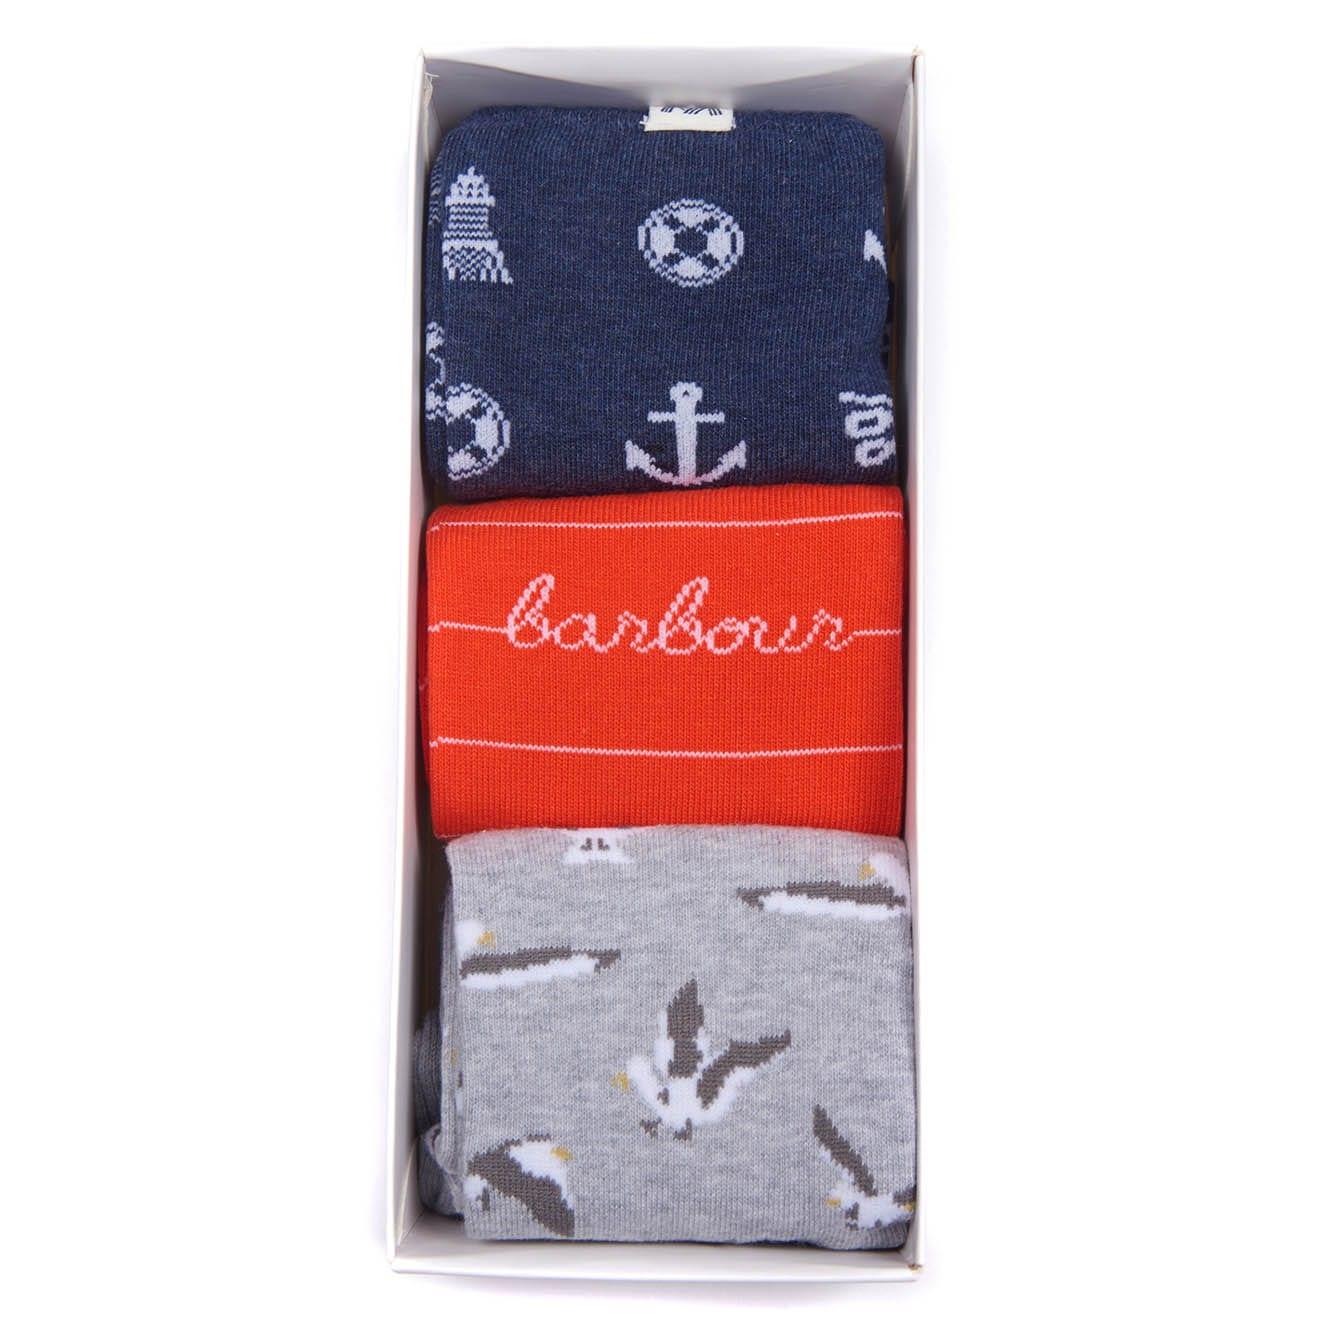 Barbour Coastal Socks 3 Pack Navy Orange